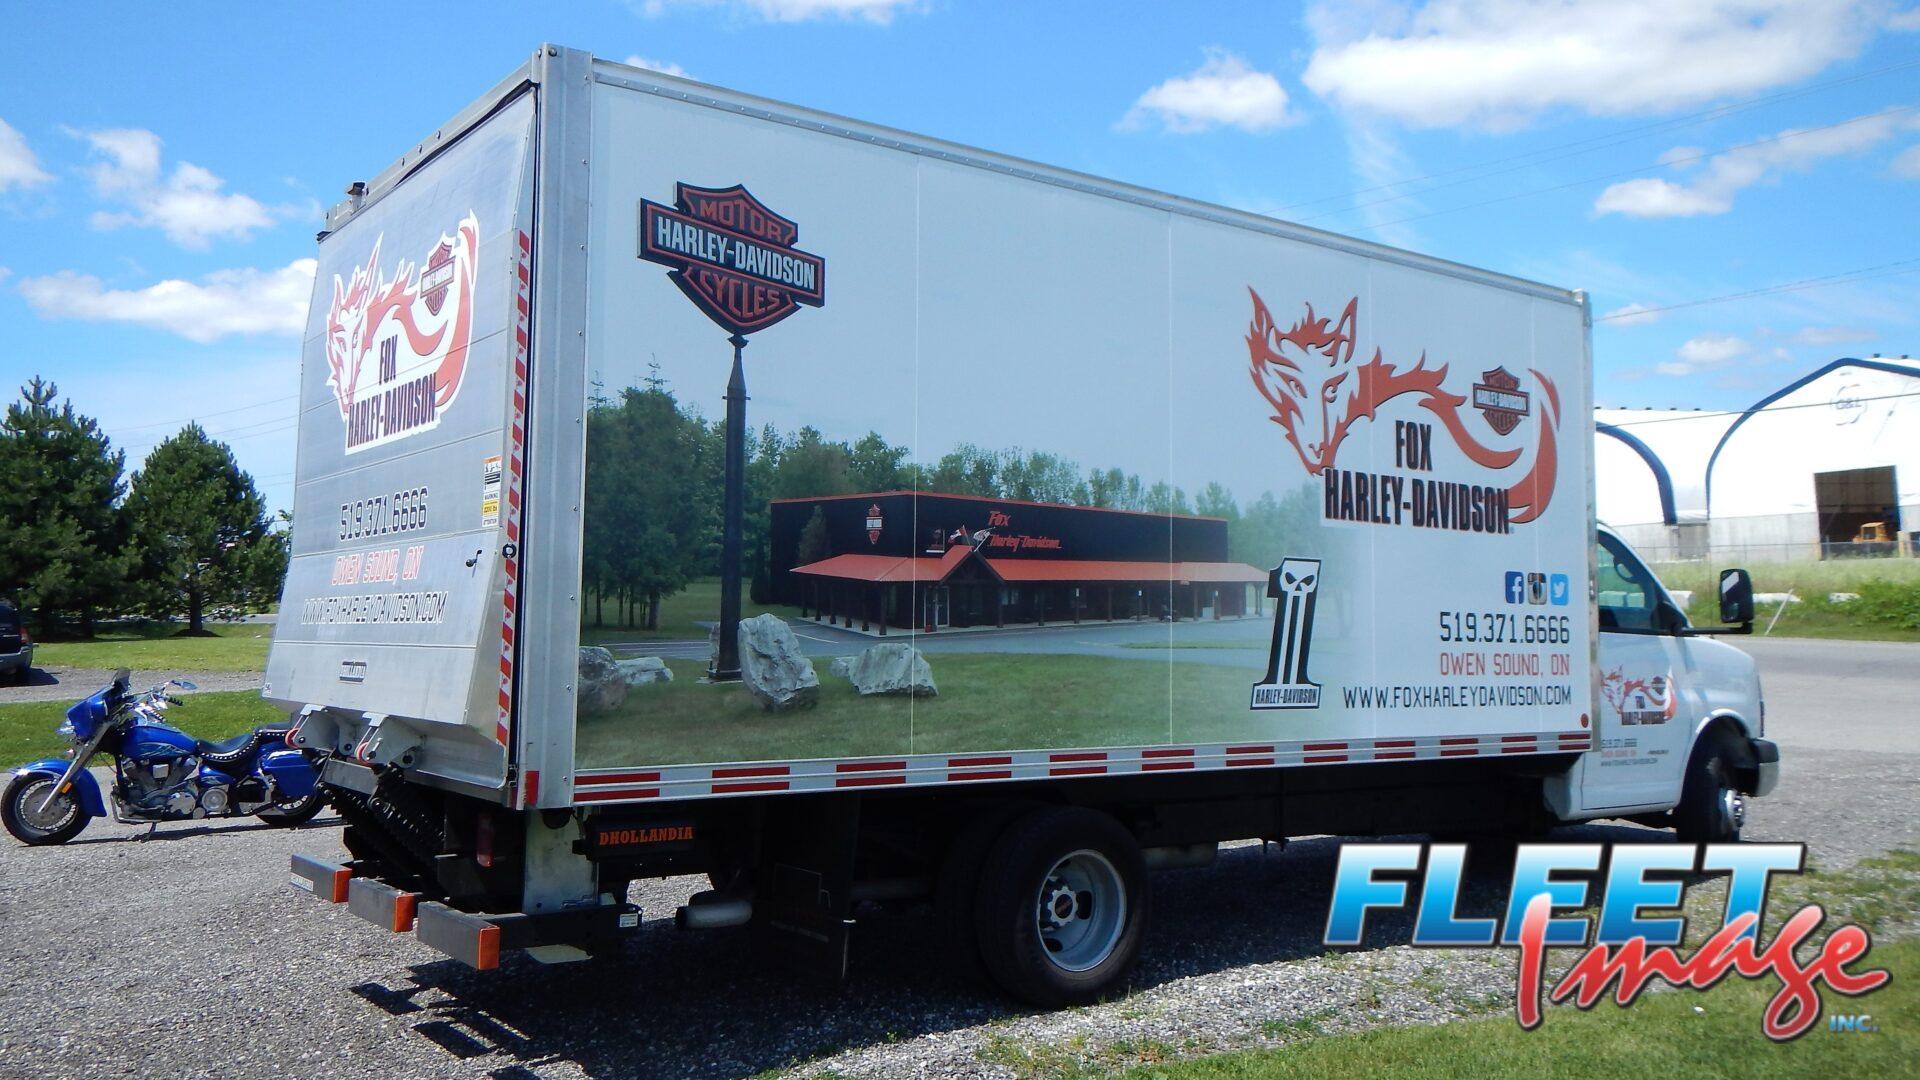 FOX HARLEY-DAVIDSONdecal sticker on a truck